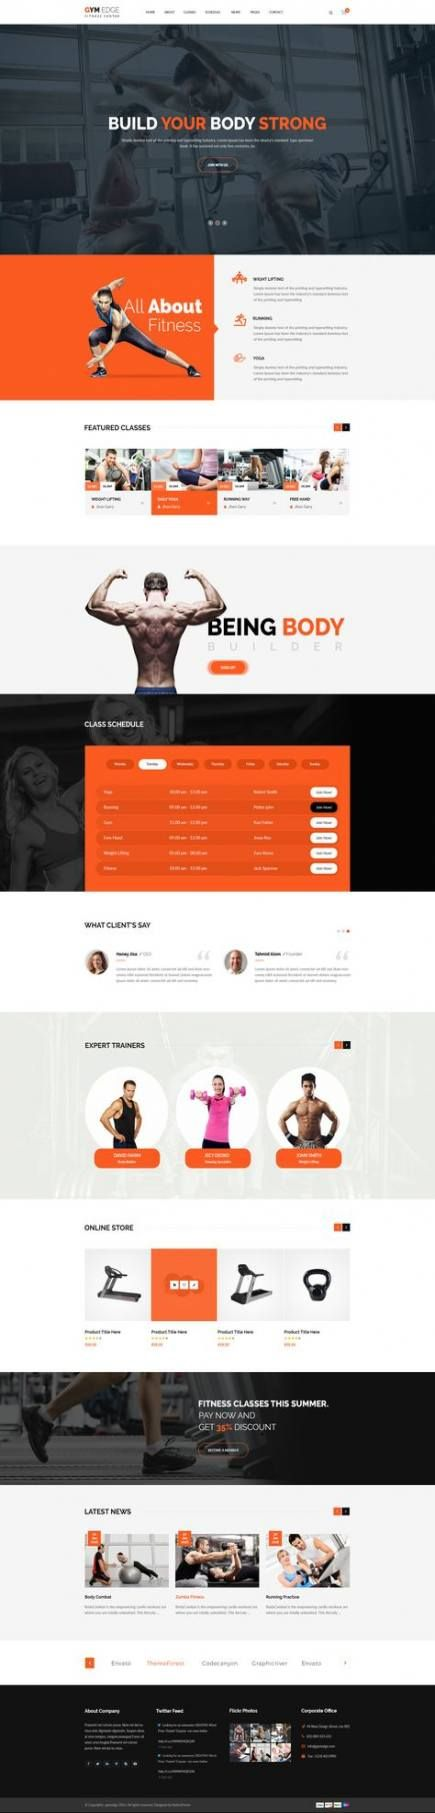 Trendy Fitness Inspiration Over 40 Website Ideas #fitness